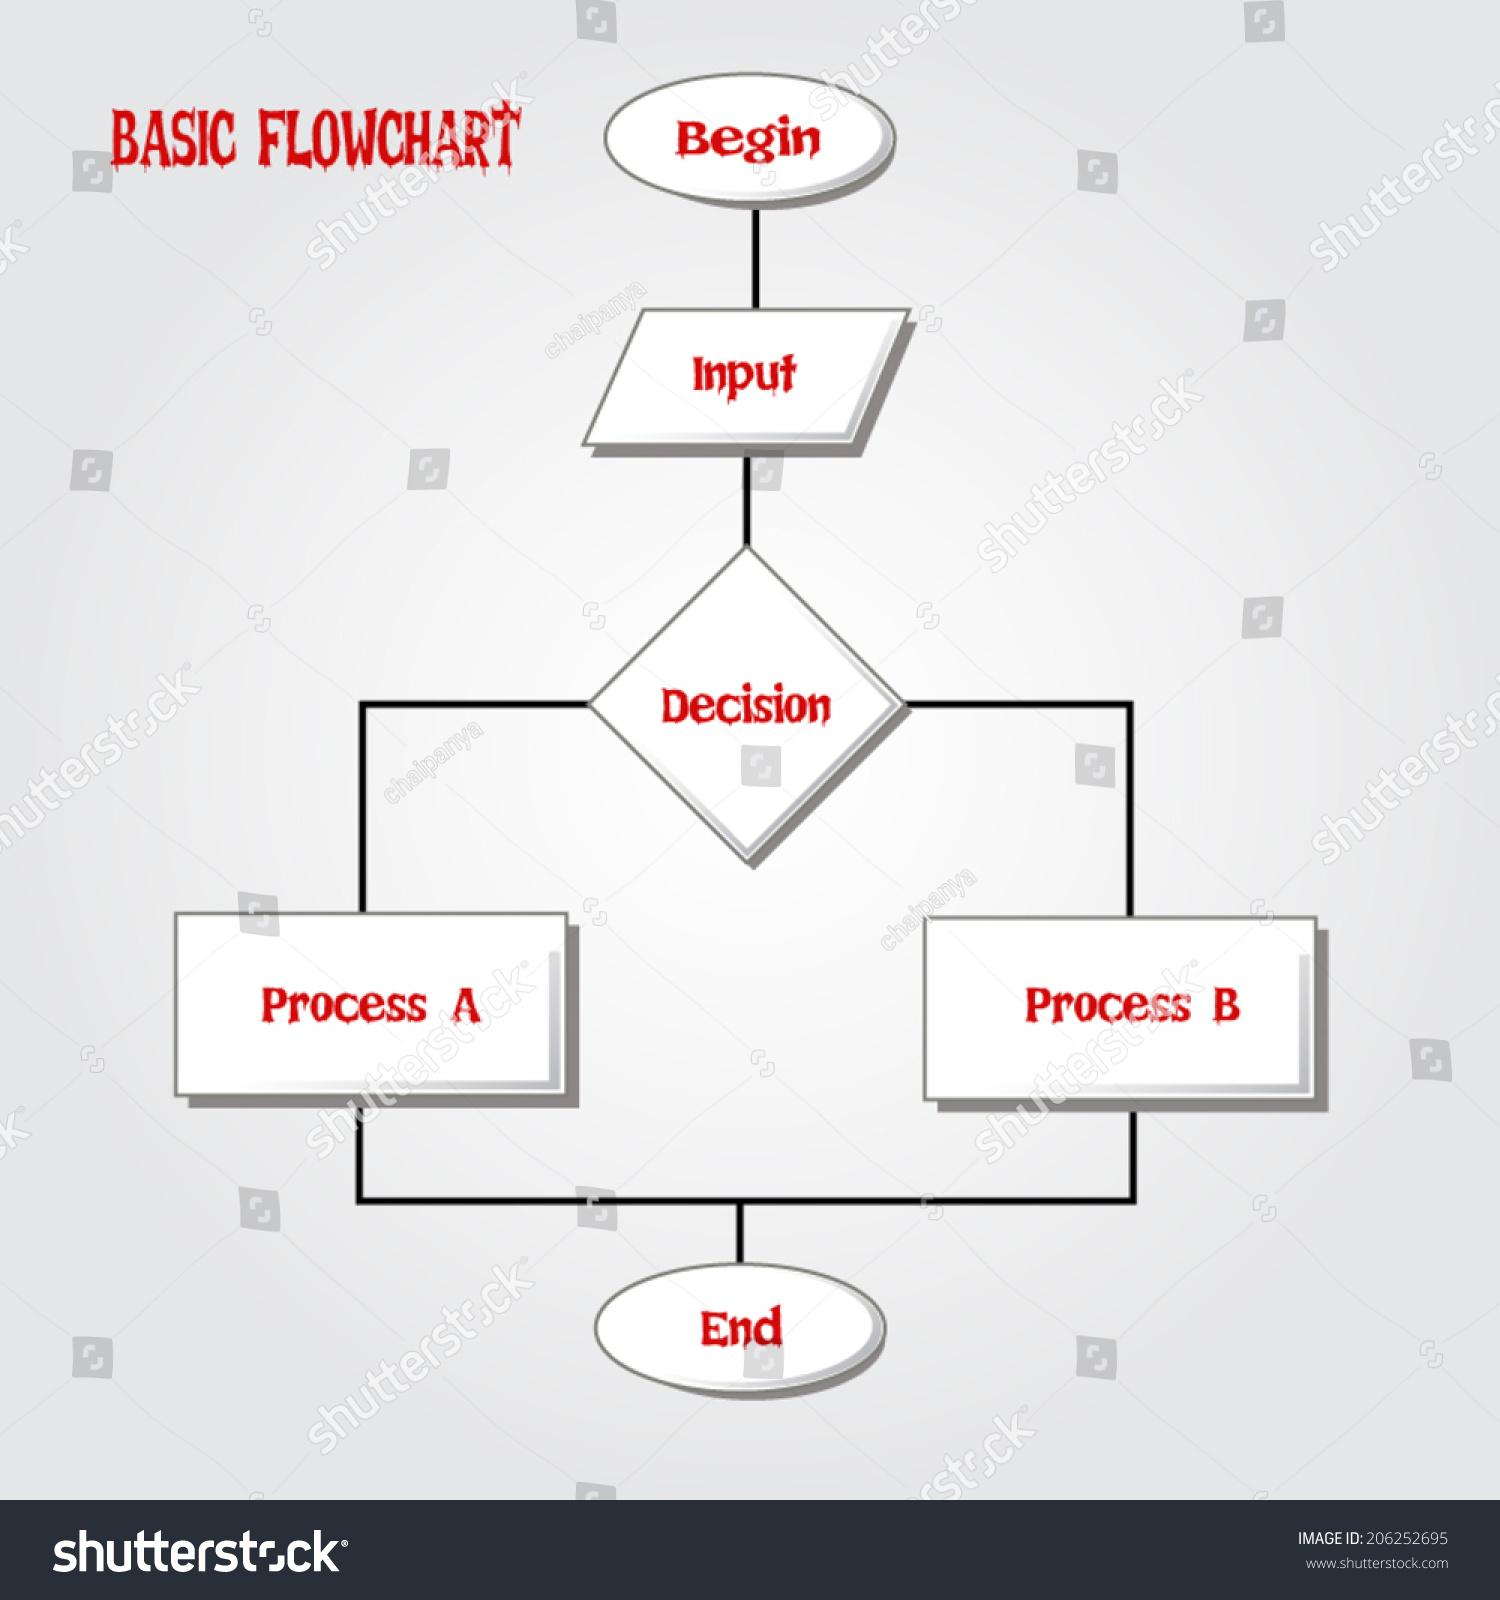 basic flowchart